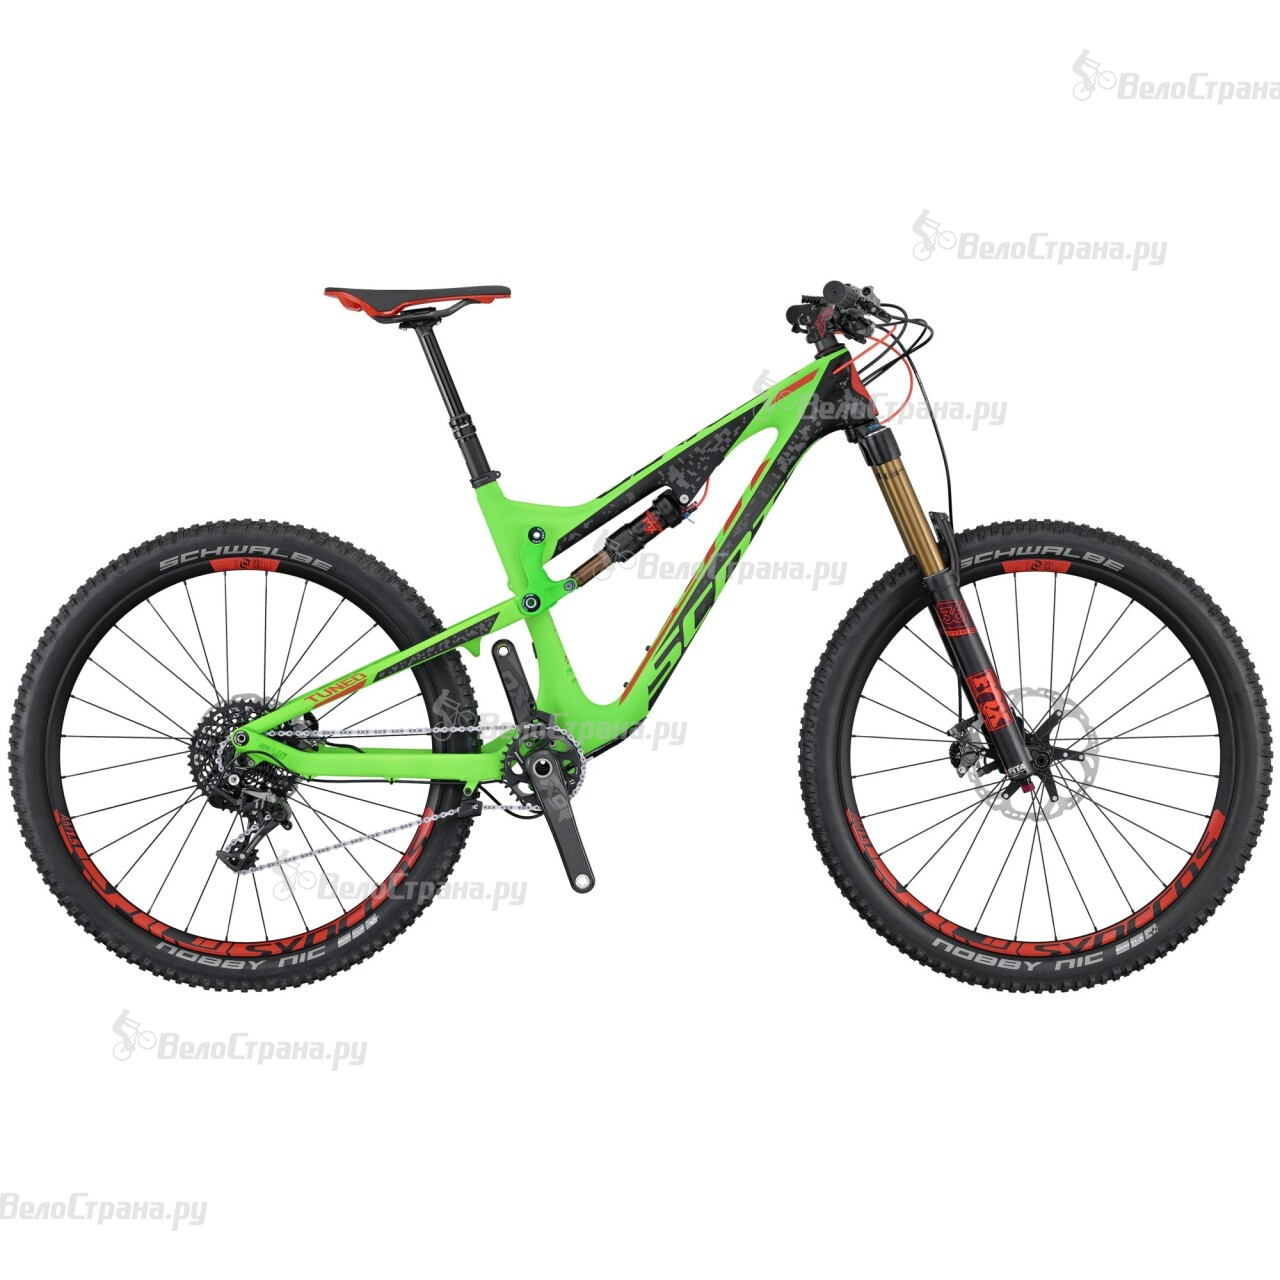 Велосипед Scott Genius LT 700 Tuned (2016) велосипед scott aspect 700 27 5 2016